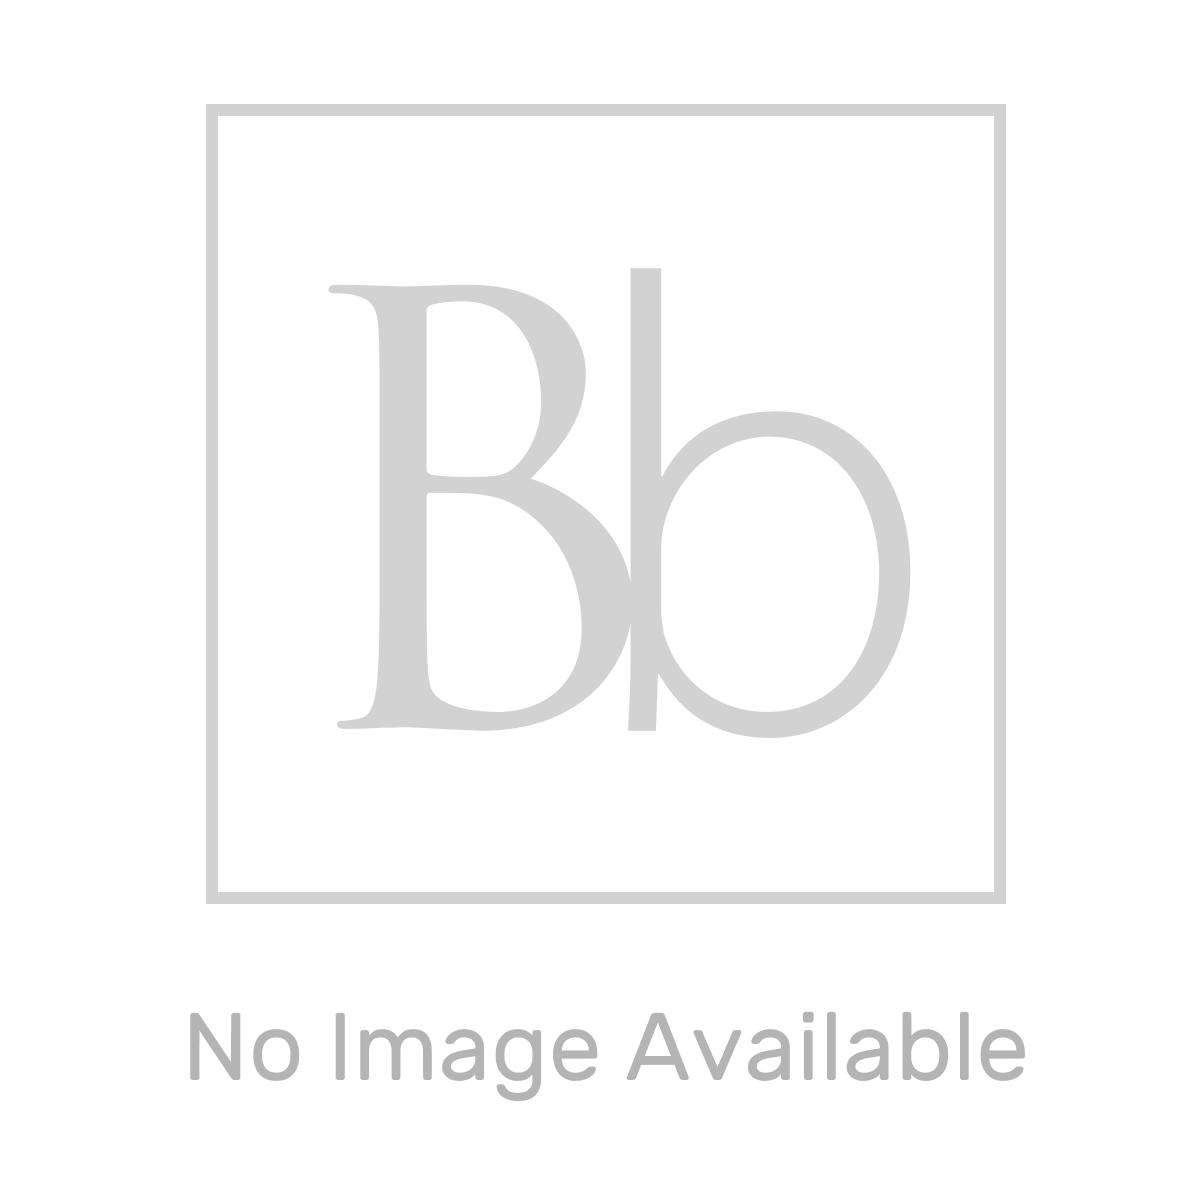 Aquadart Black Slate Shower Tray 1500 x 800 Lifestyle